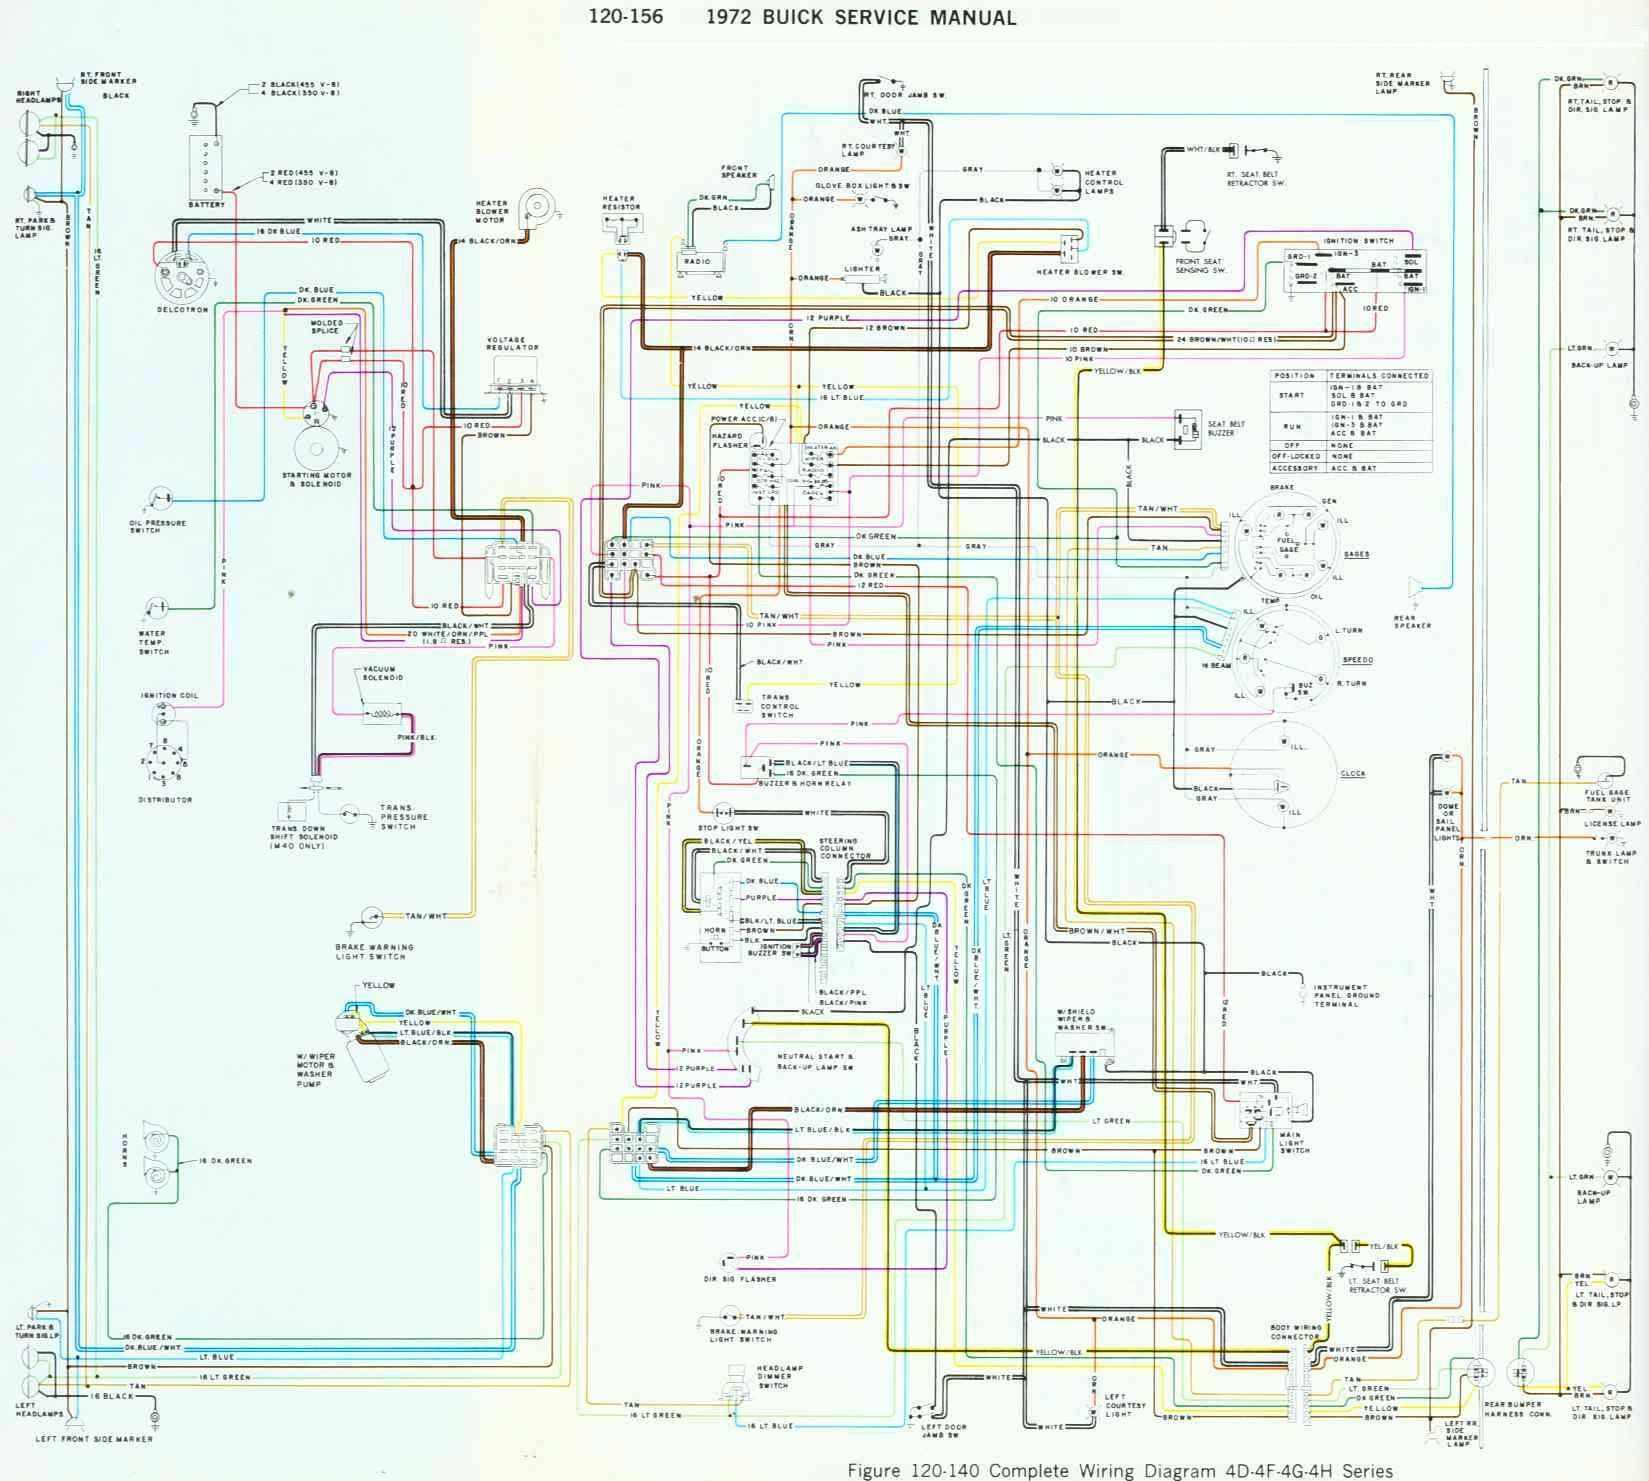 medium resolution of 1952 plymouth cranbrook wiring diagram wiring library rh 14 codingcommunity de 1968 dodge dart wiring